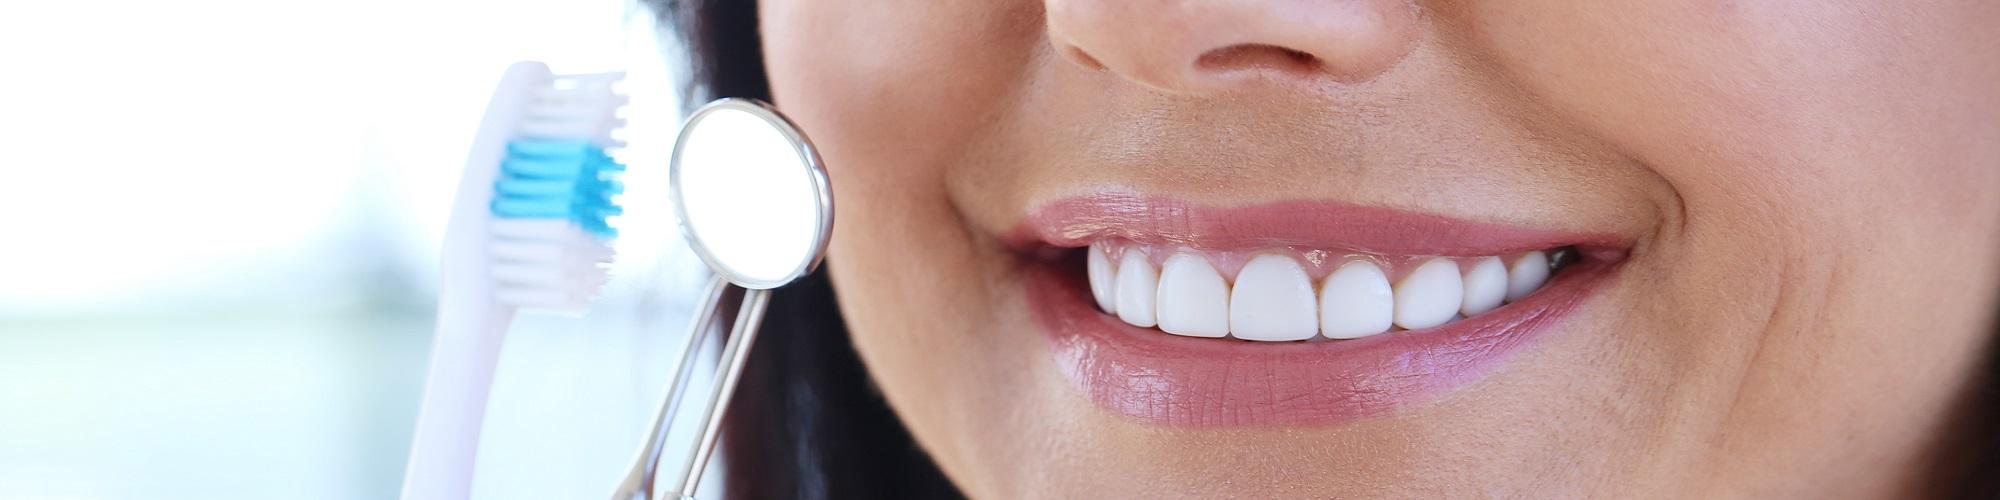 About Deerfield Dentists Dr. Ali Tekdogan, founder of Great Smile Deerfield